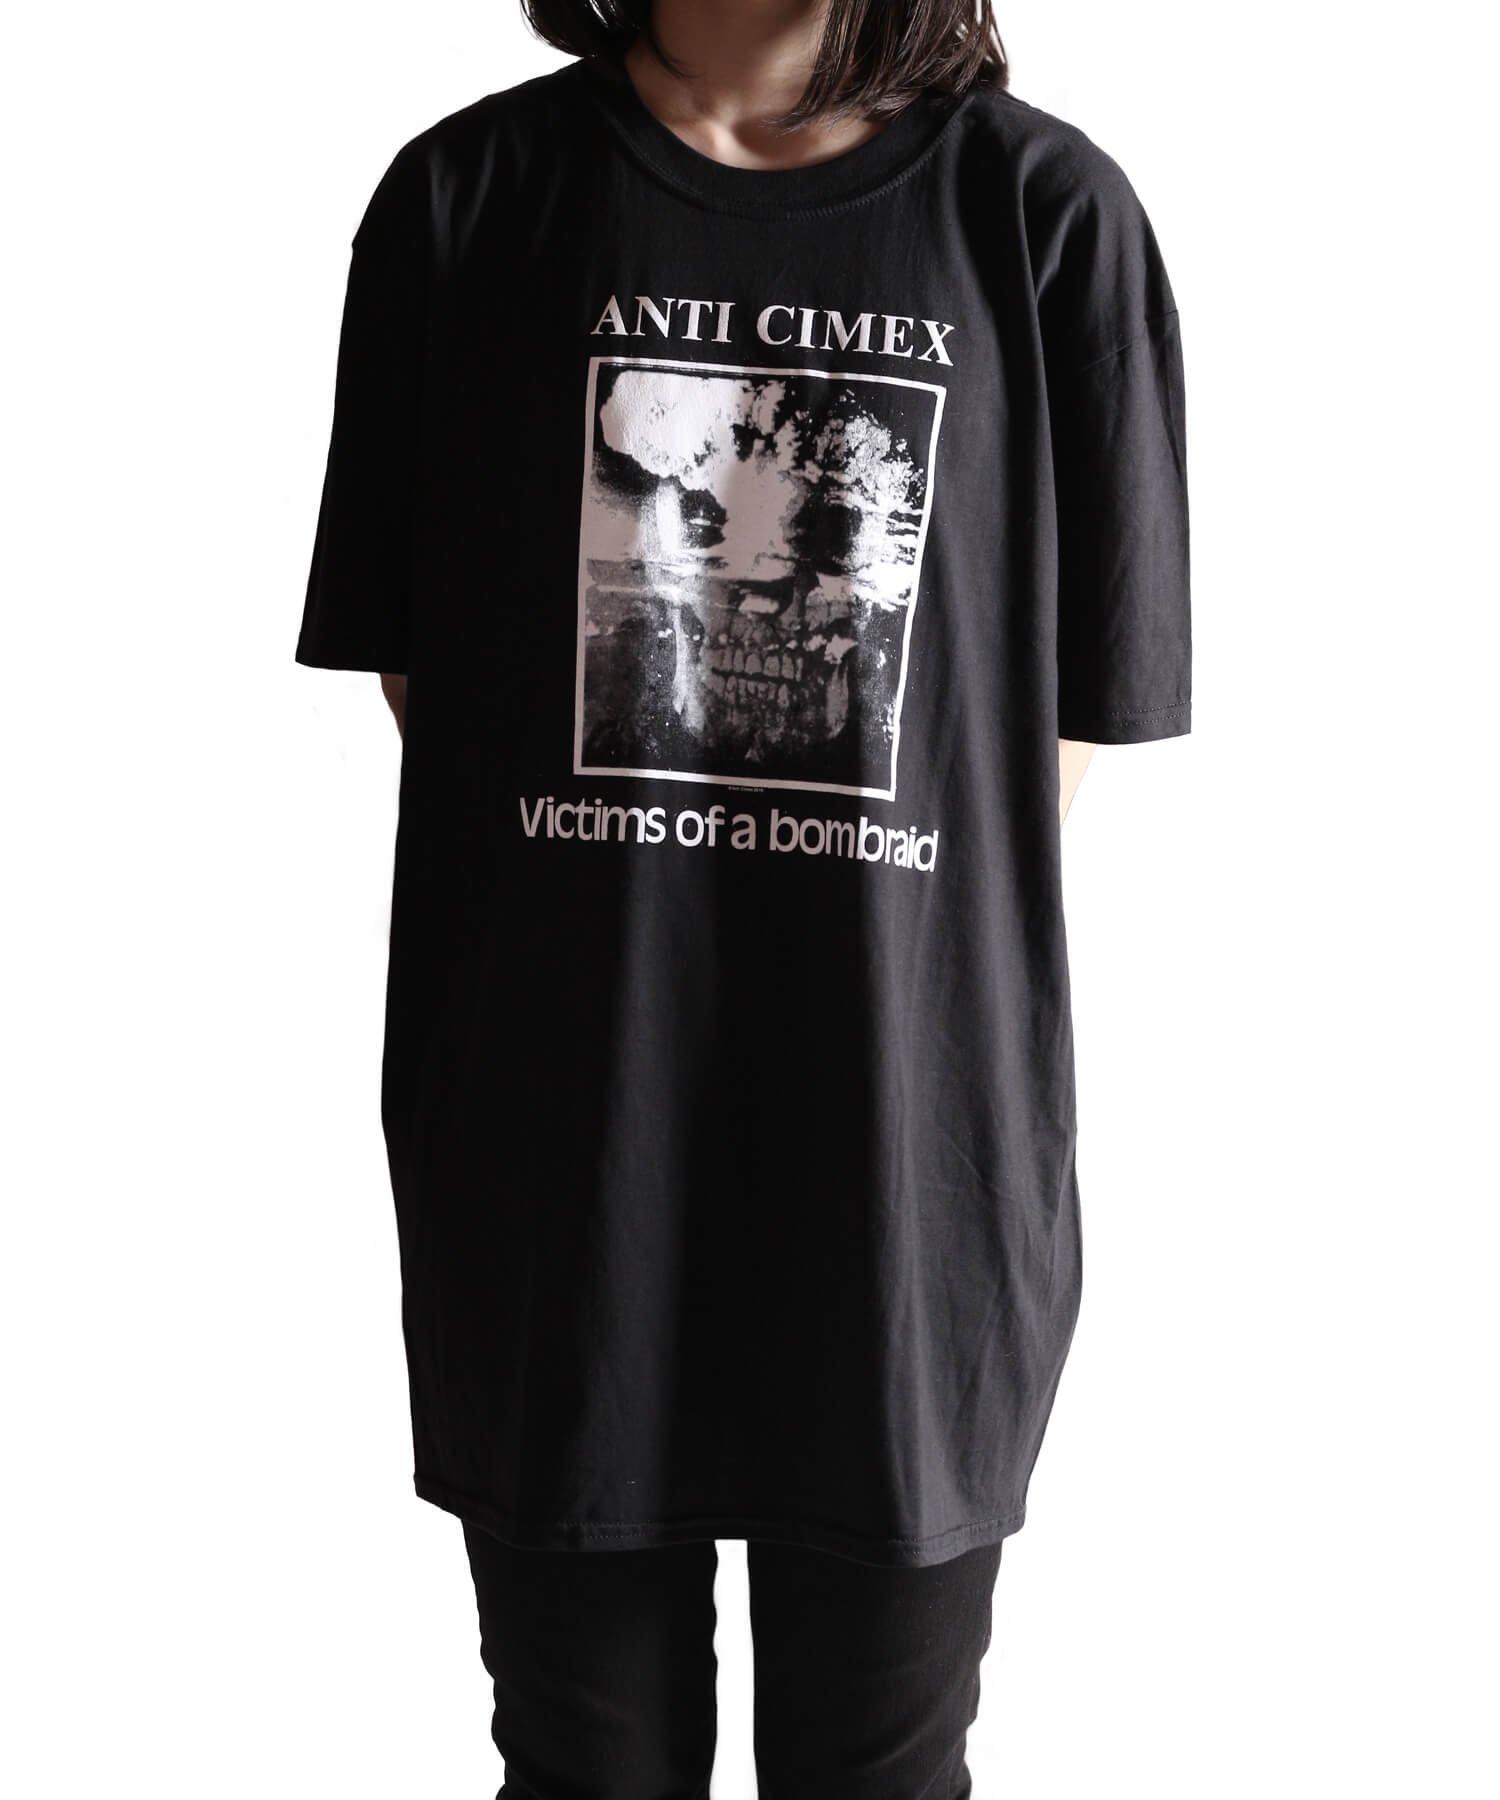 Official Artist Goods / バンドTなど |ANTI CIMEX / アンチ サイメックス:VICTIMS OF A BOMB RAID T-SHIRT (BLACK)商品画像12